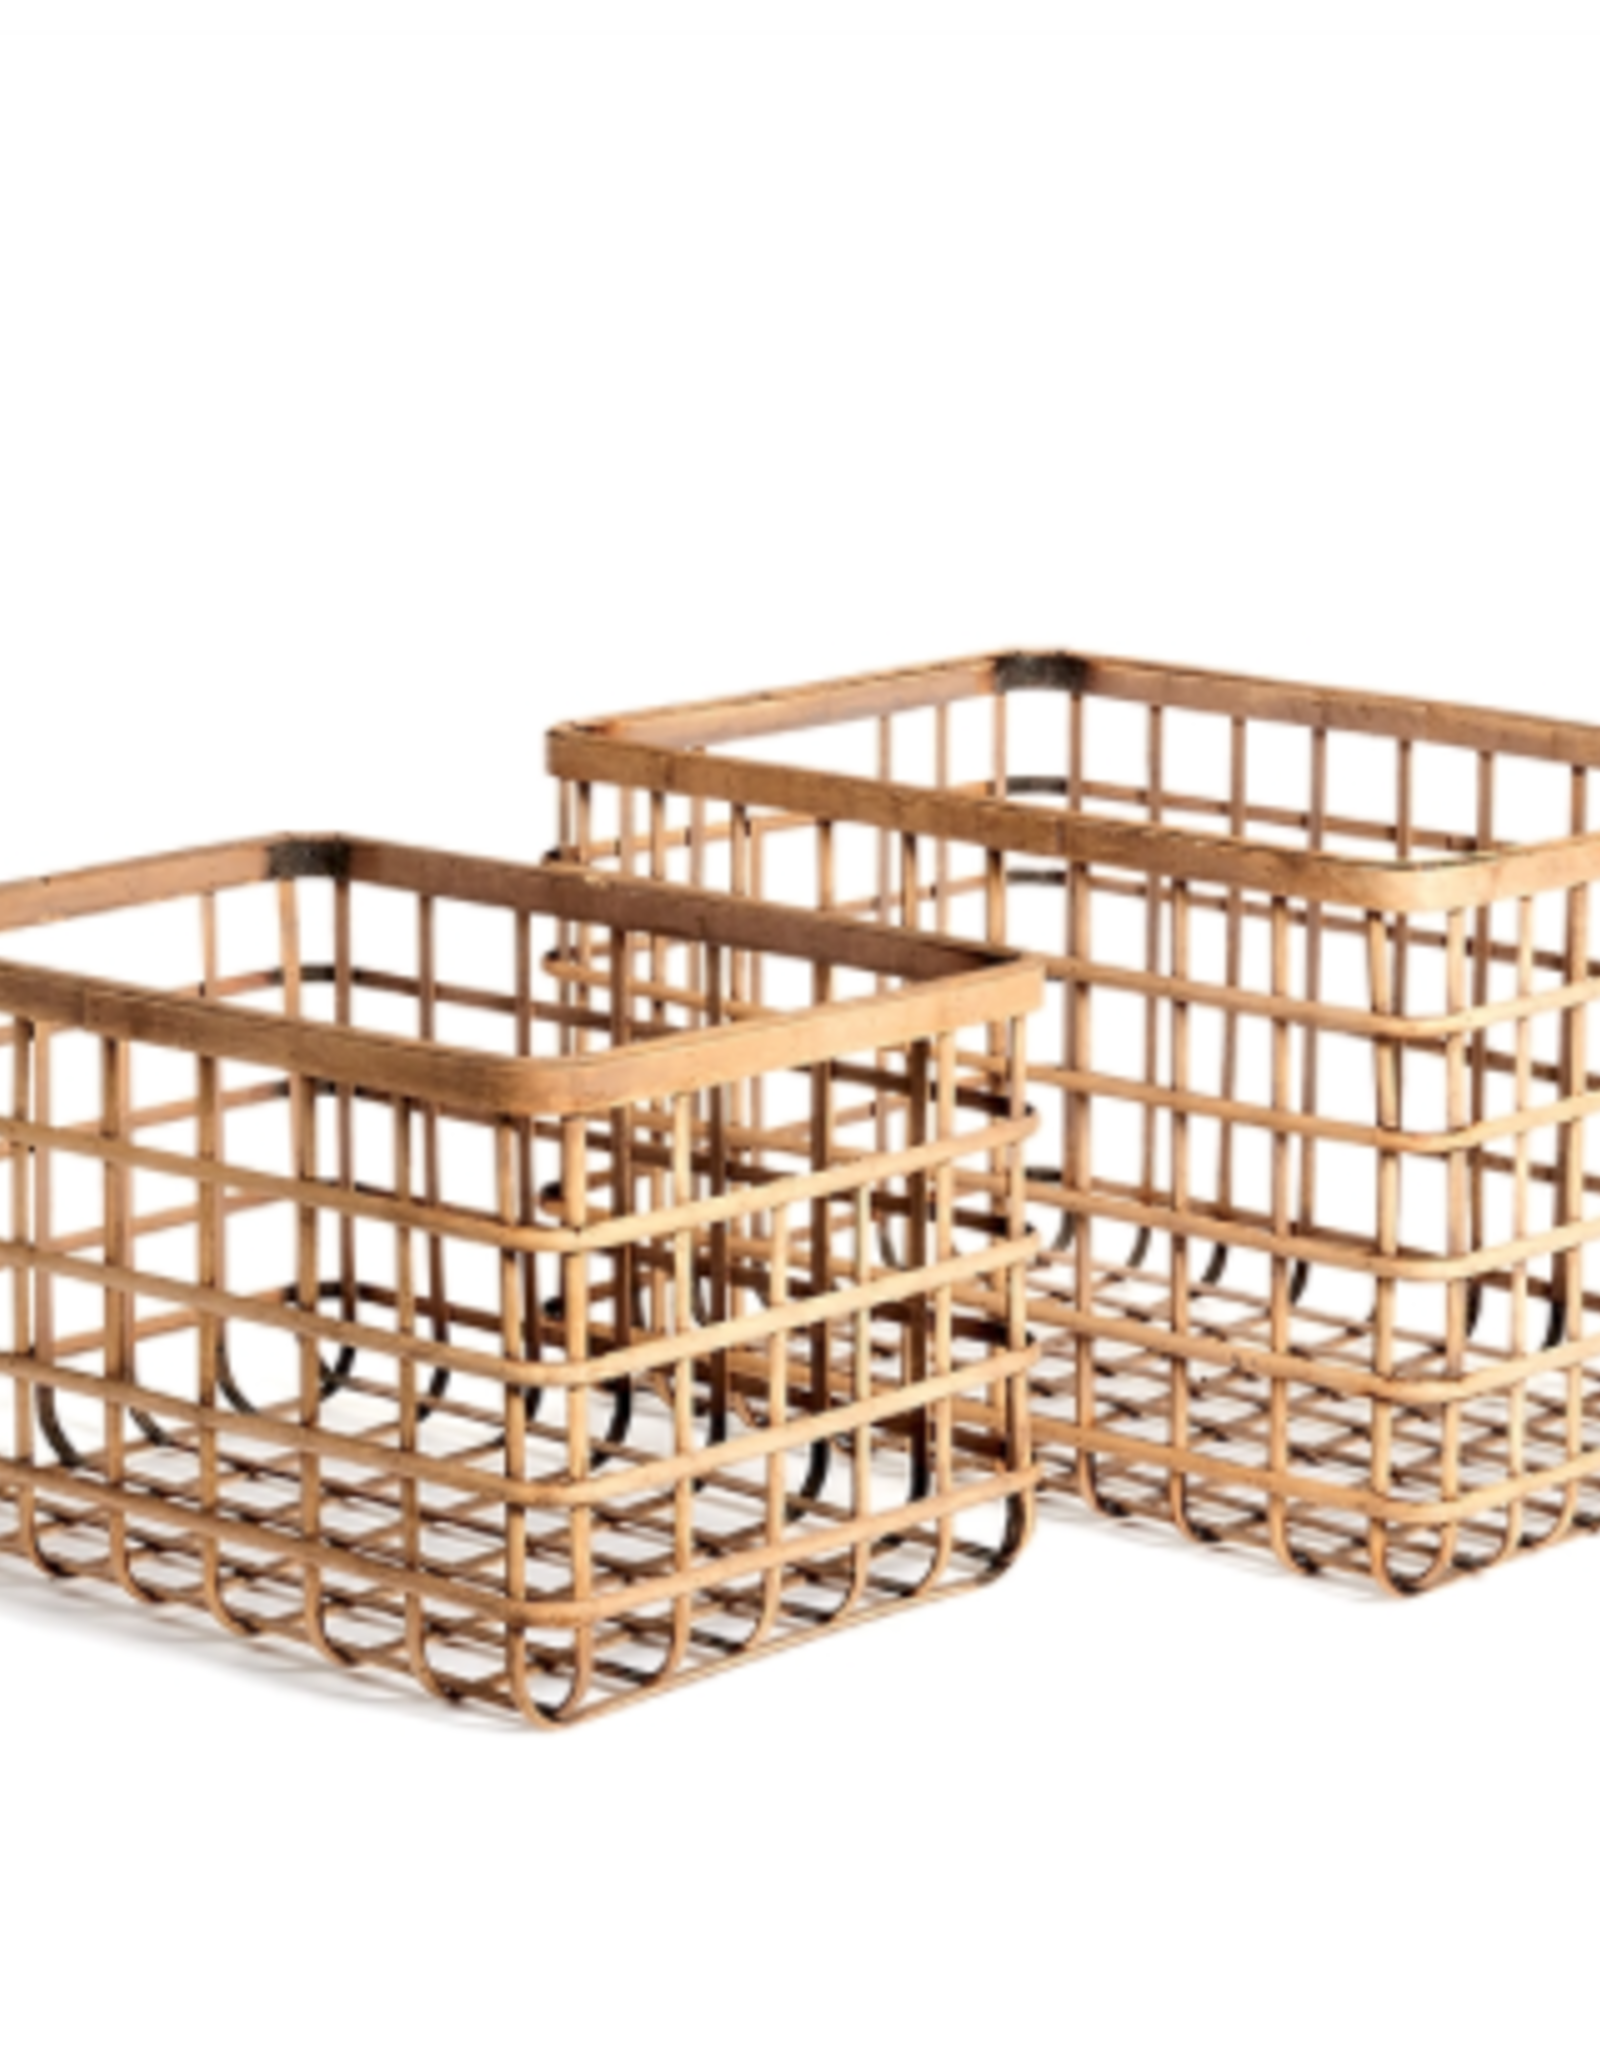 Large Natural Bamboo Rectangular Basket